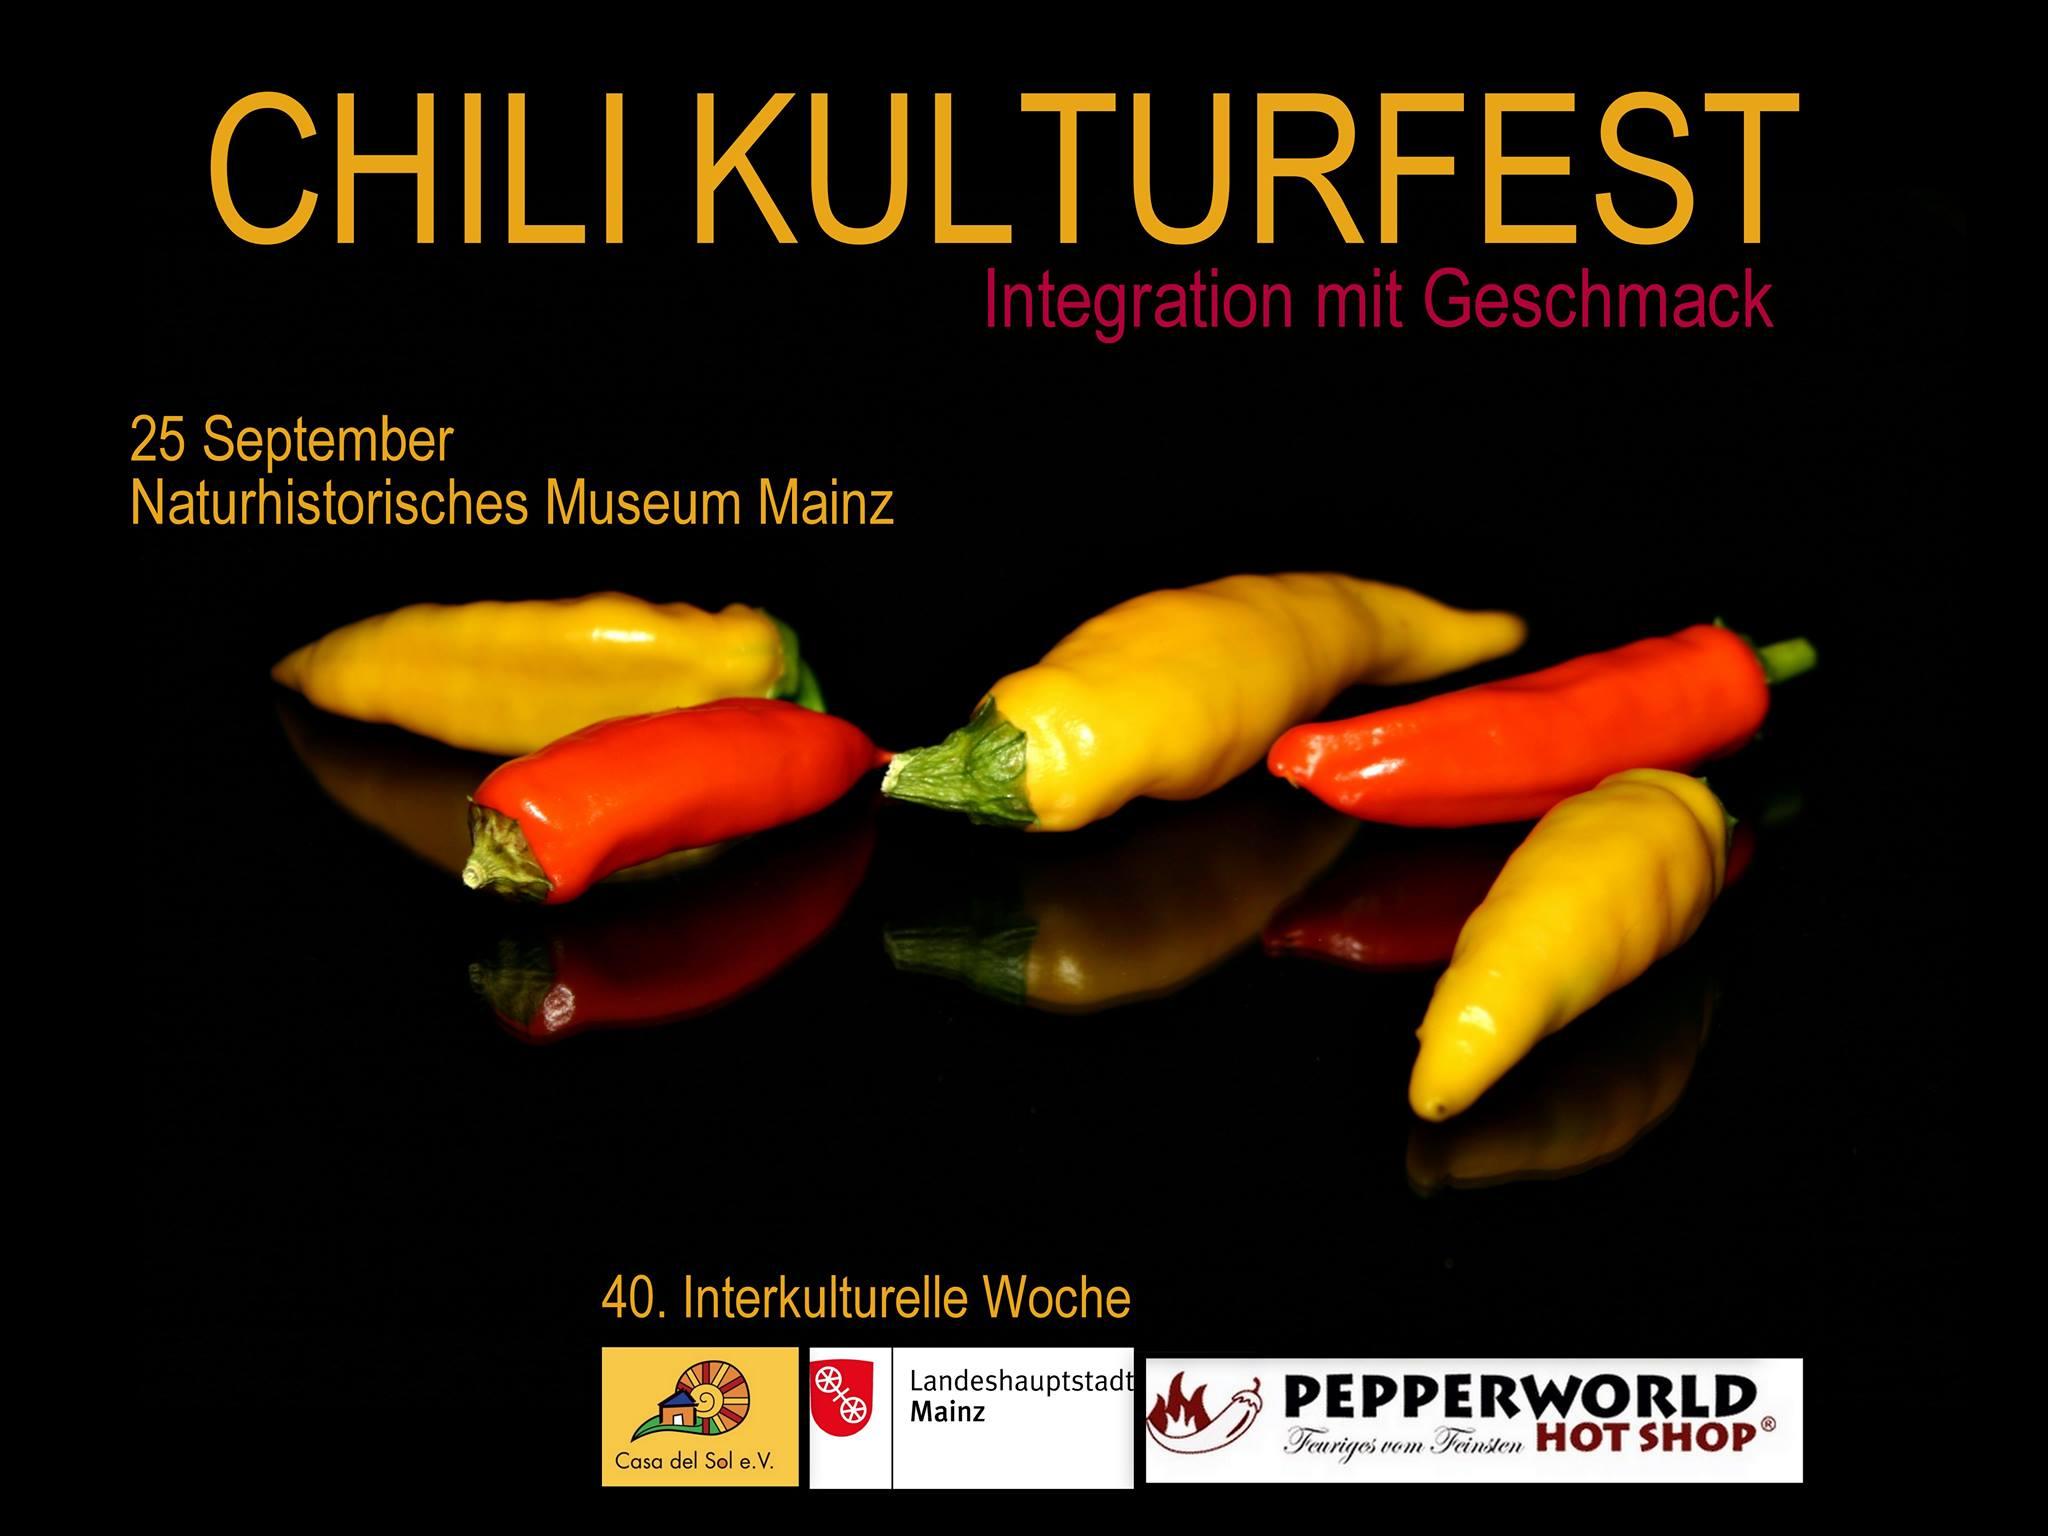 Chili-Kulturfest 2015